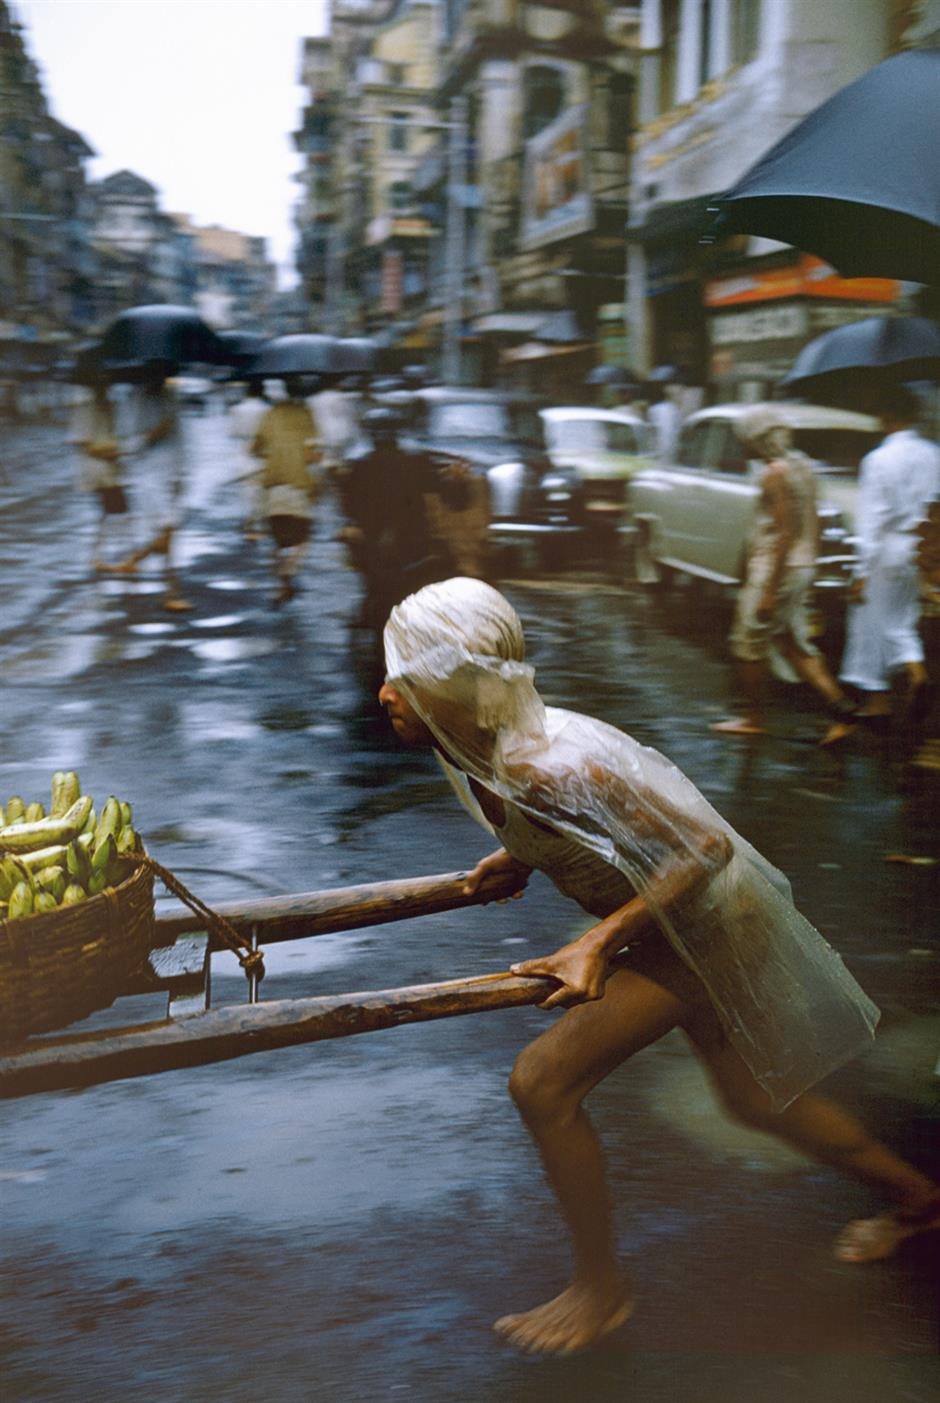 Exhibit hails power of camera's storytelling